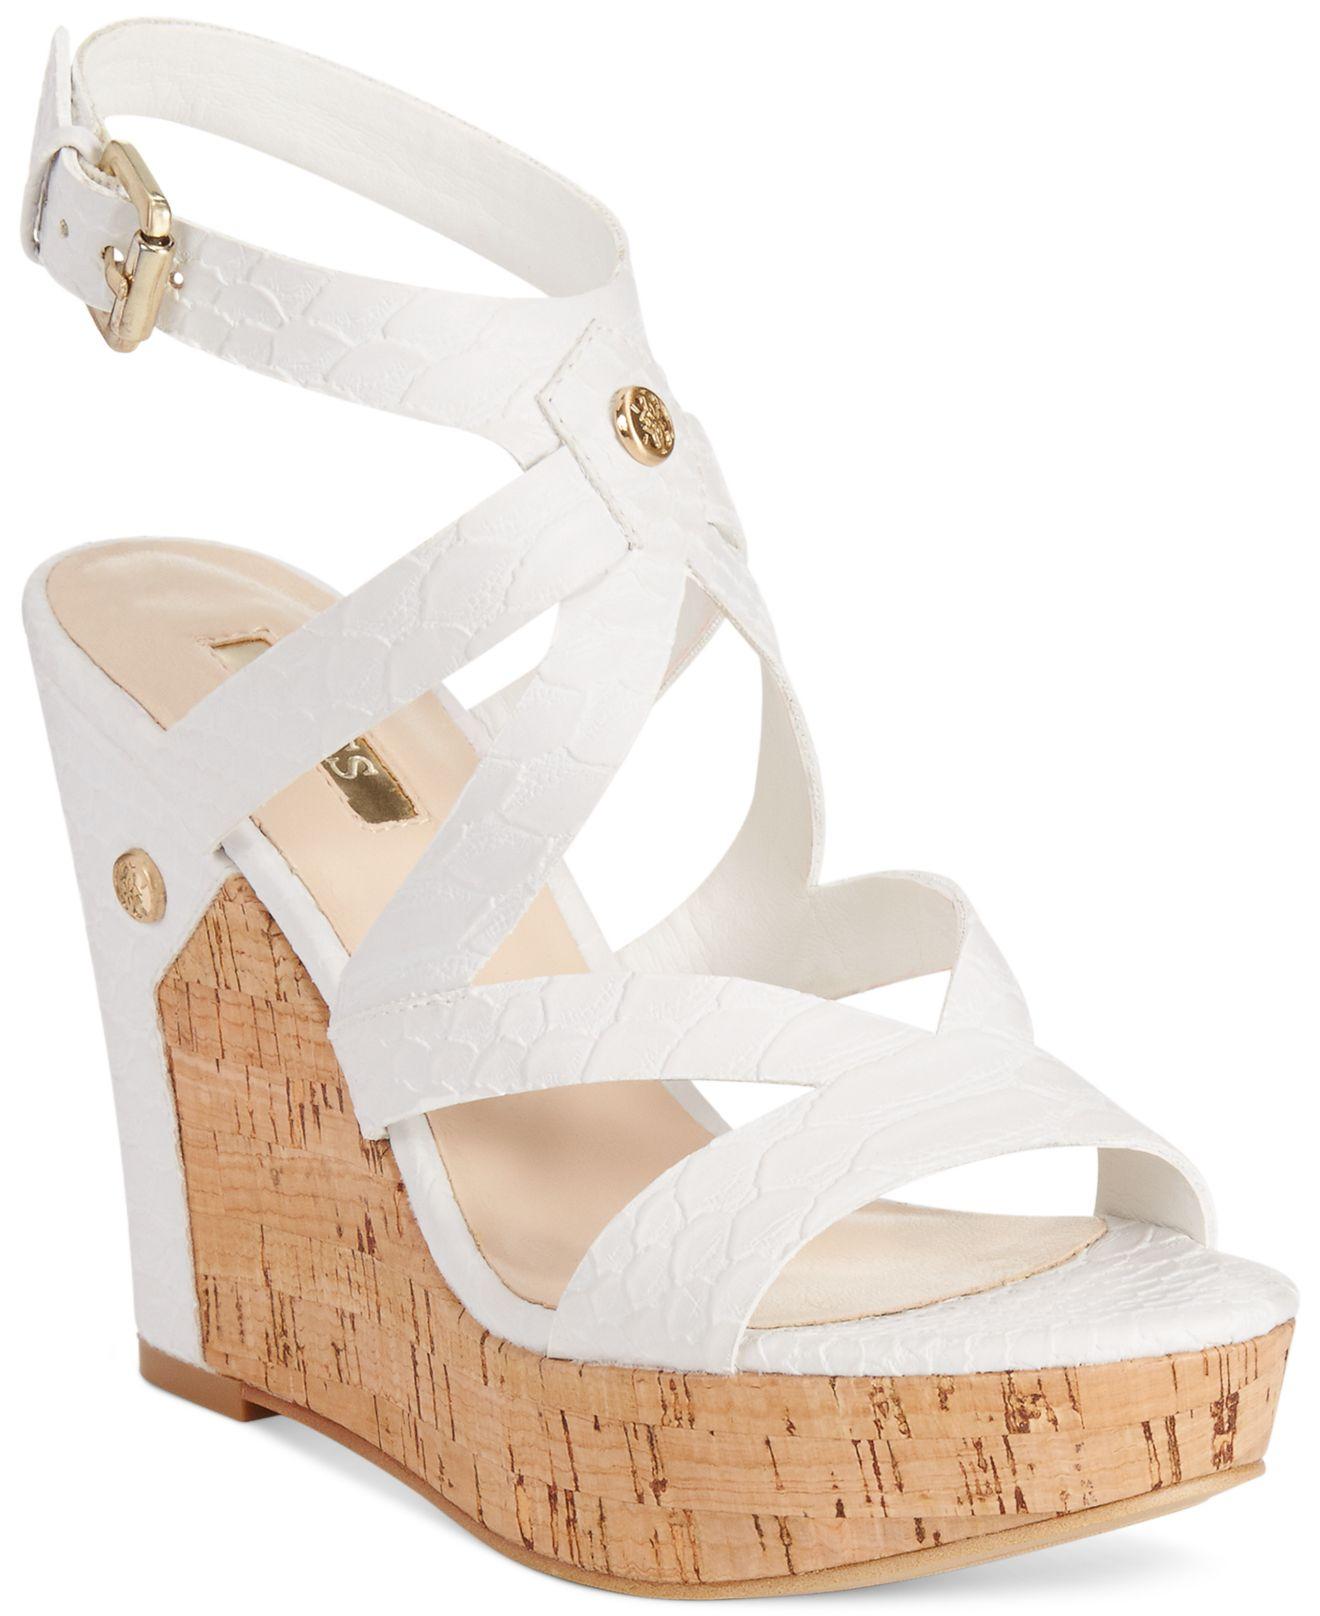 3c2bcf5ff Guess Women'S Harlee Cork Platform Wedge Sandals in White - Lyst